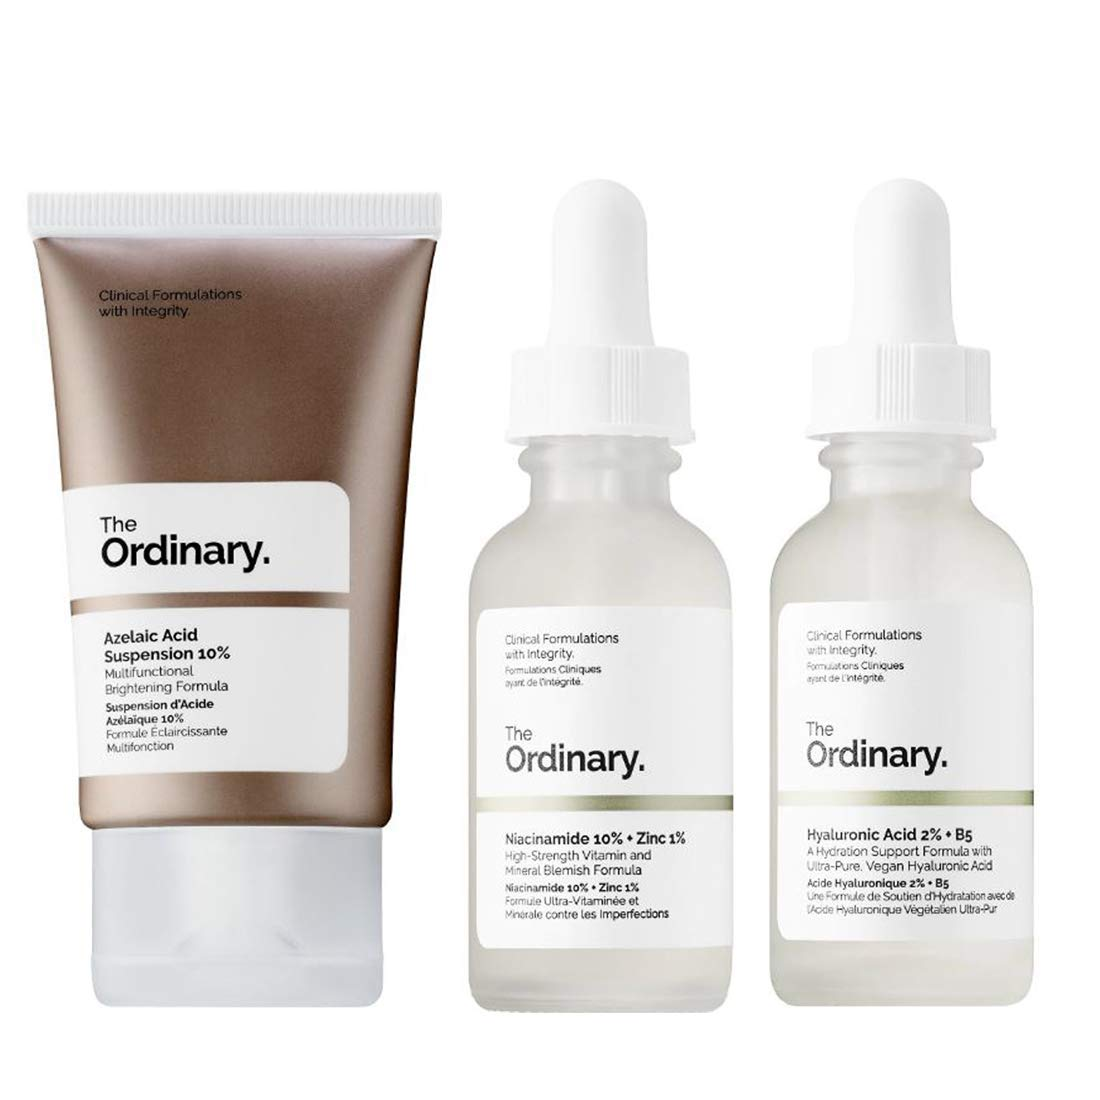 The Ordinary Facial Skincare Set! Azelaic Acid Suspension With Brightening Formula! Niacinamide Serum Reduces Skin Blemishes! Hyaluronic Acid Hydrating Face Serum! Vegan, Paraben Free & Cruelty Free!